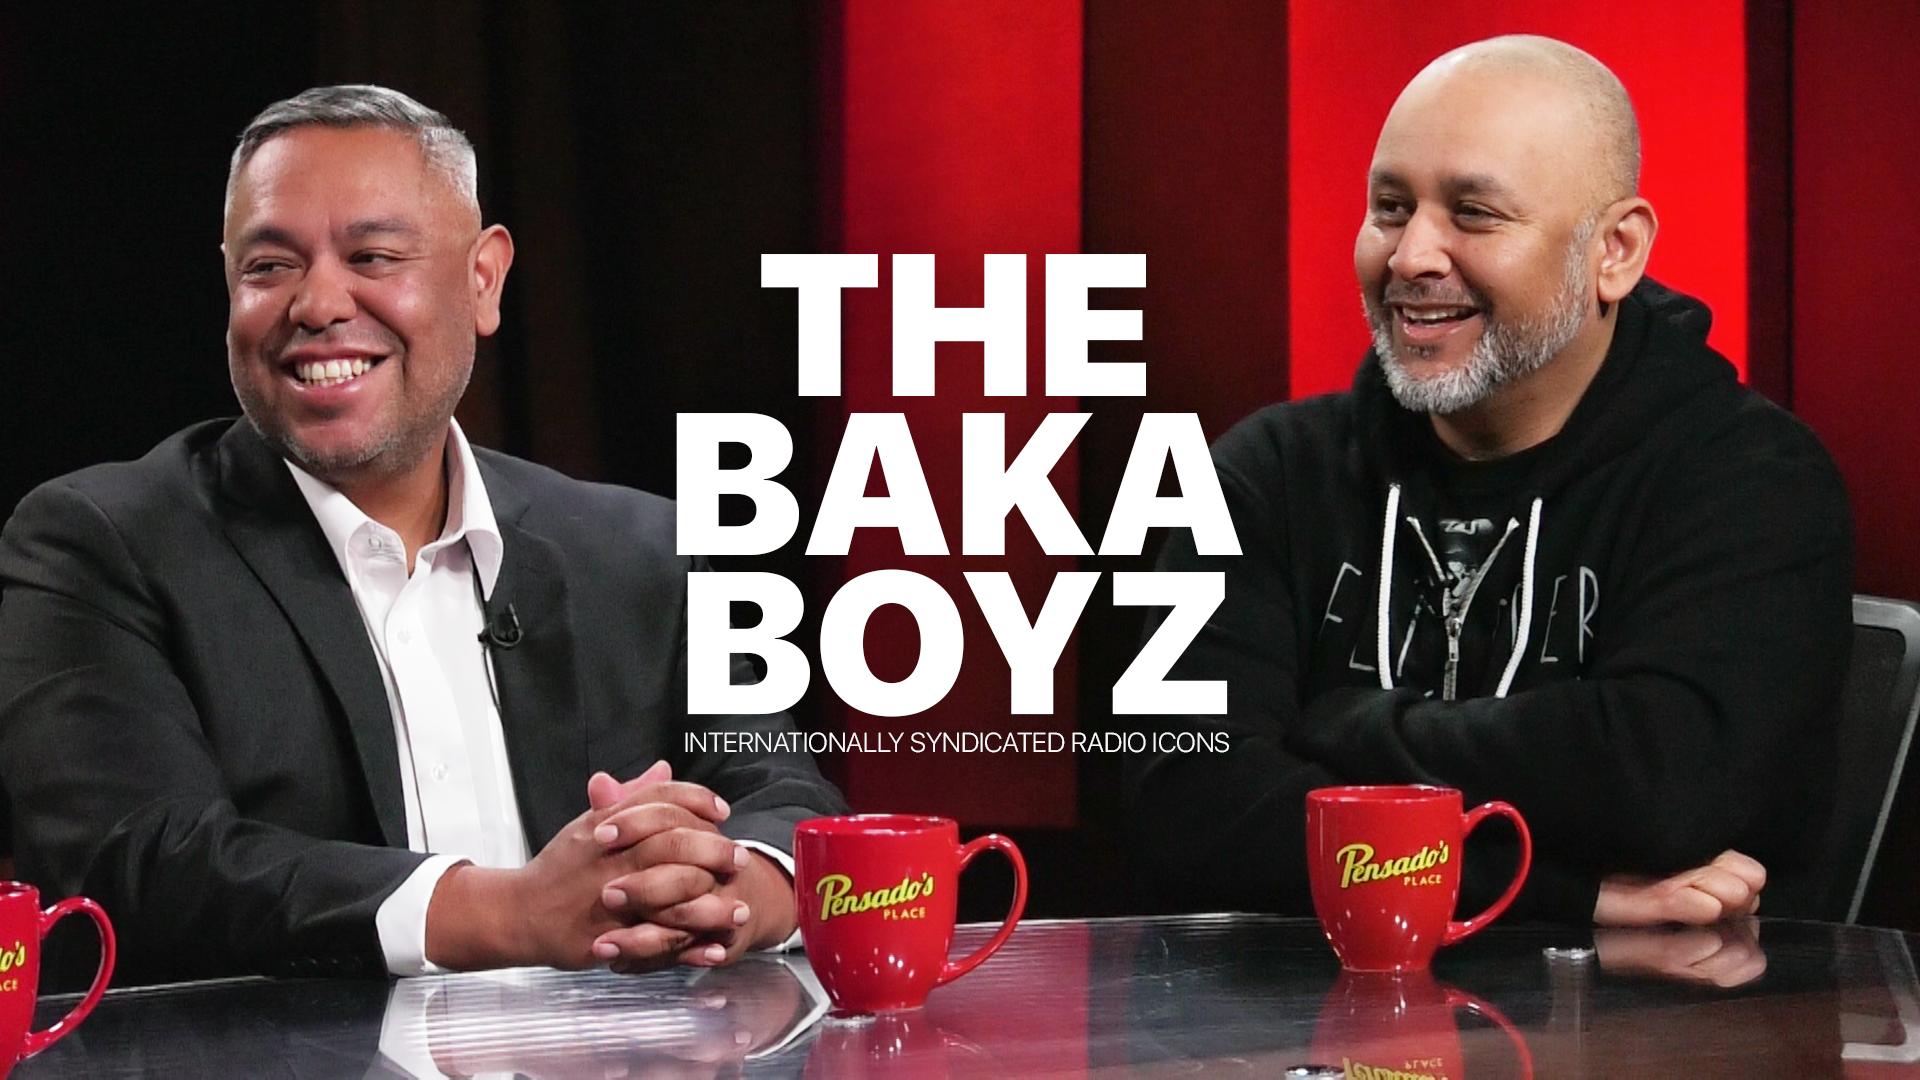 Legendary Radio Icons, The Baka Boyz